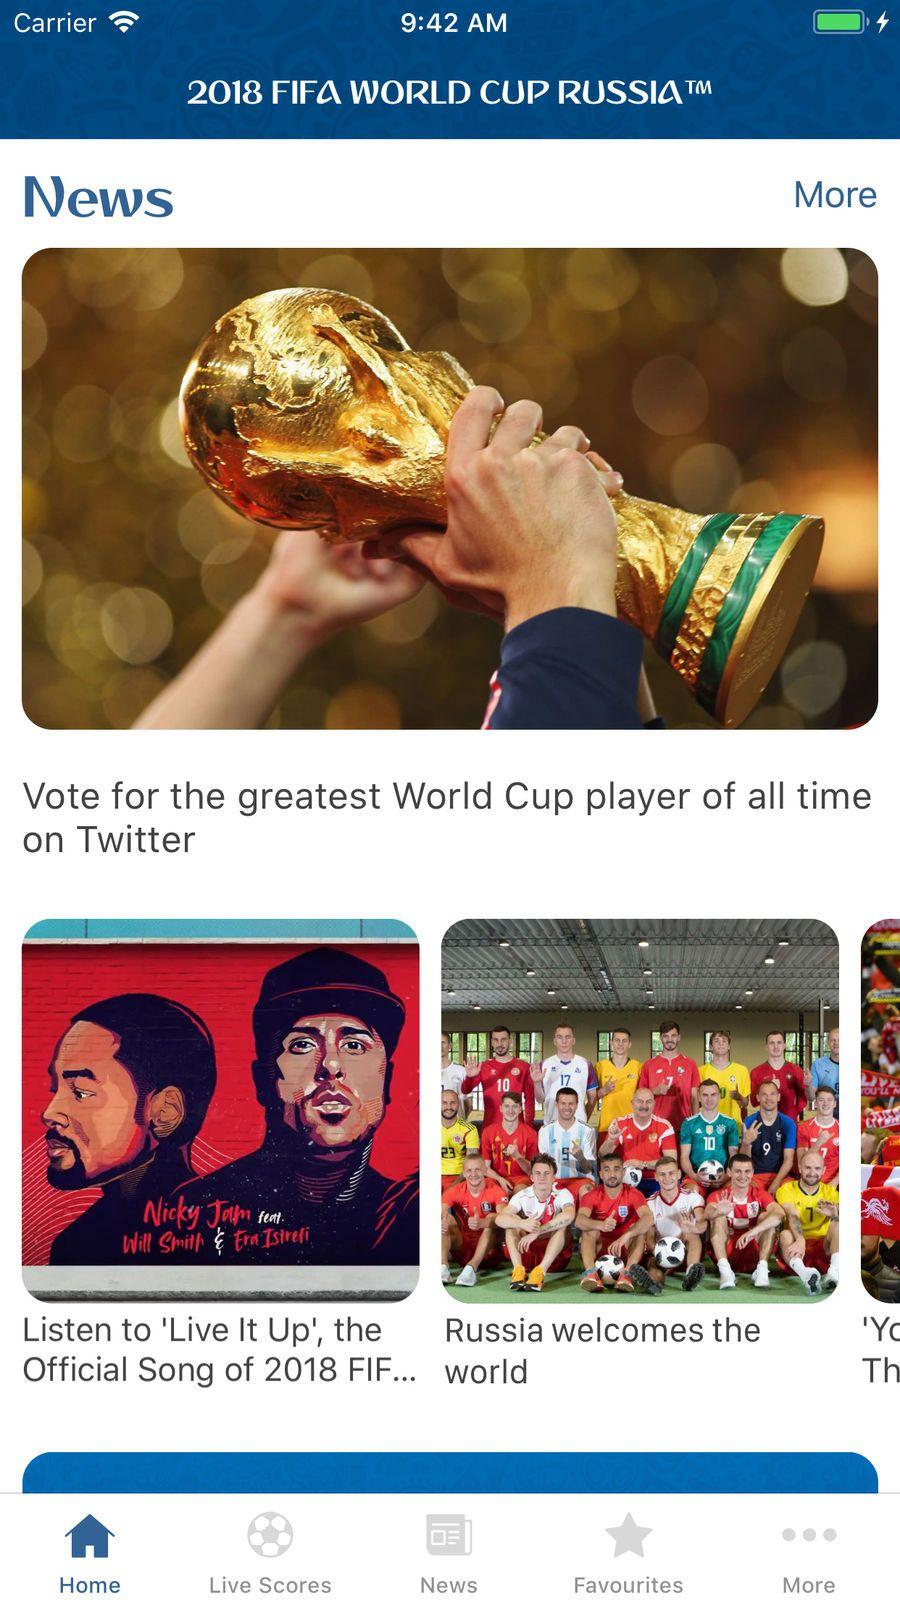 2018 FIFA World Cup Russia鈩?20EntertainmentSportsapps